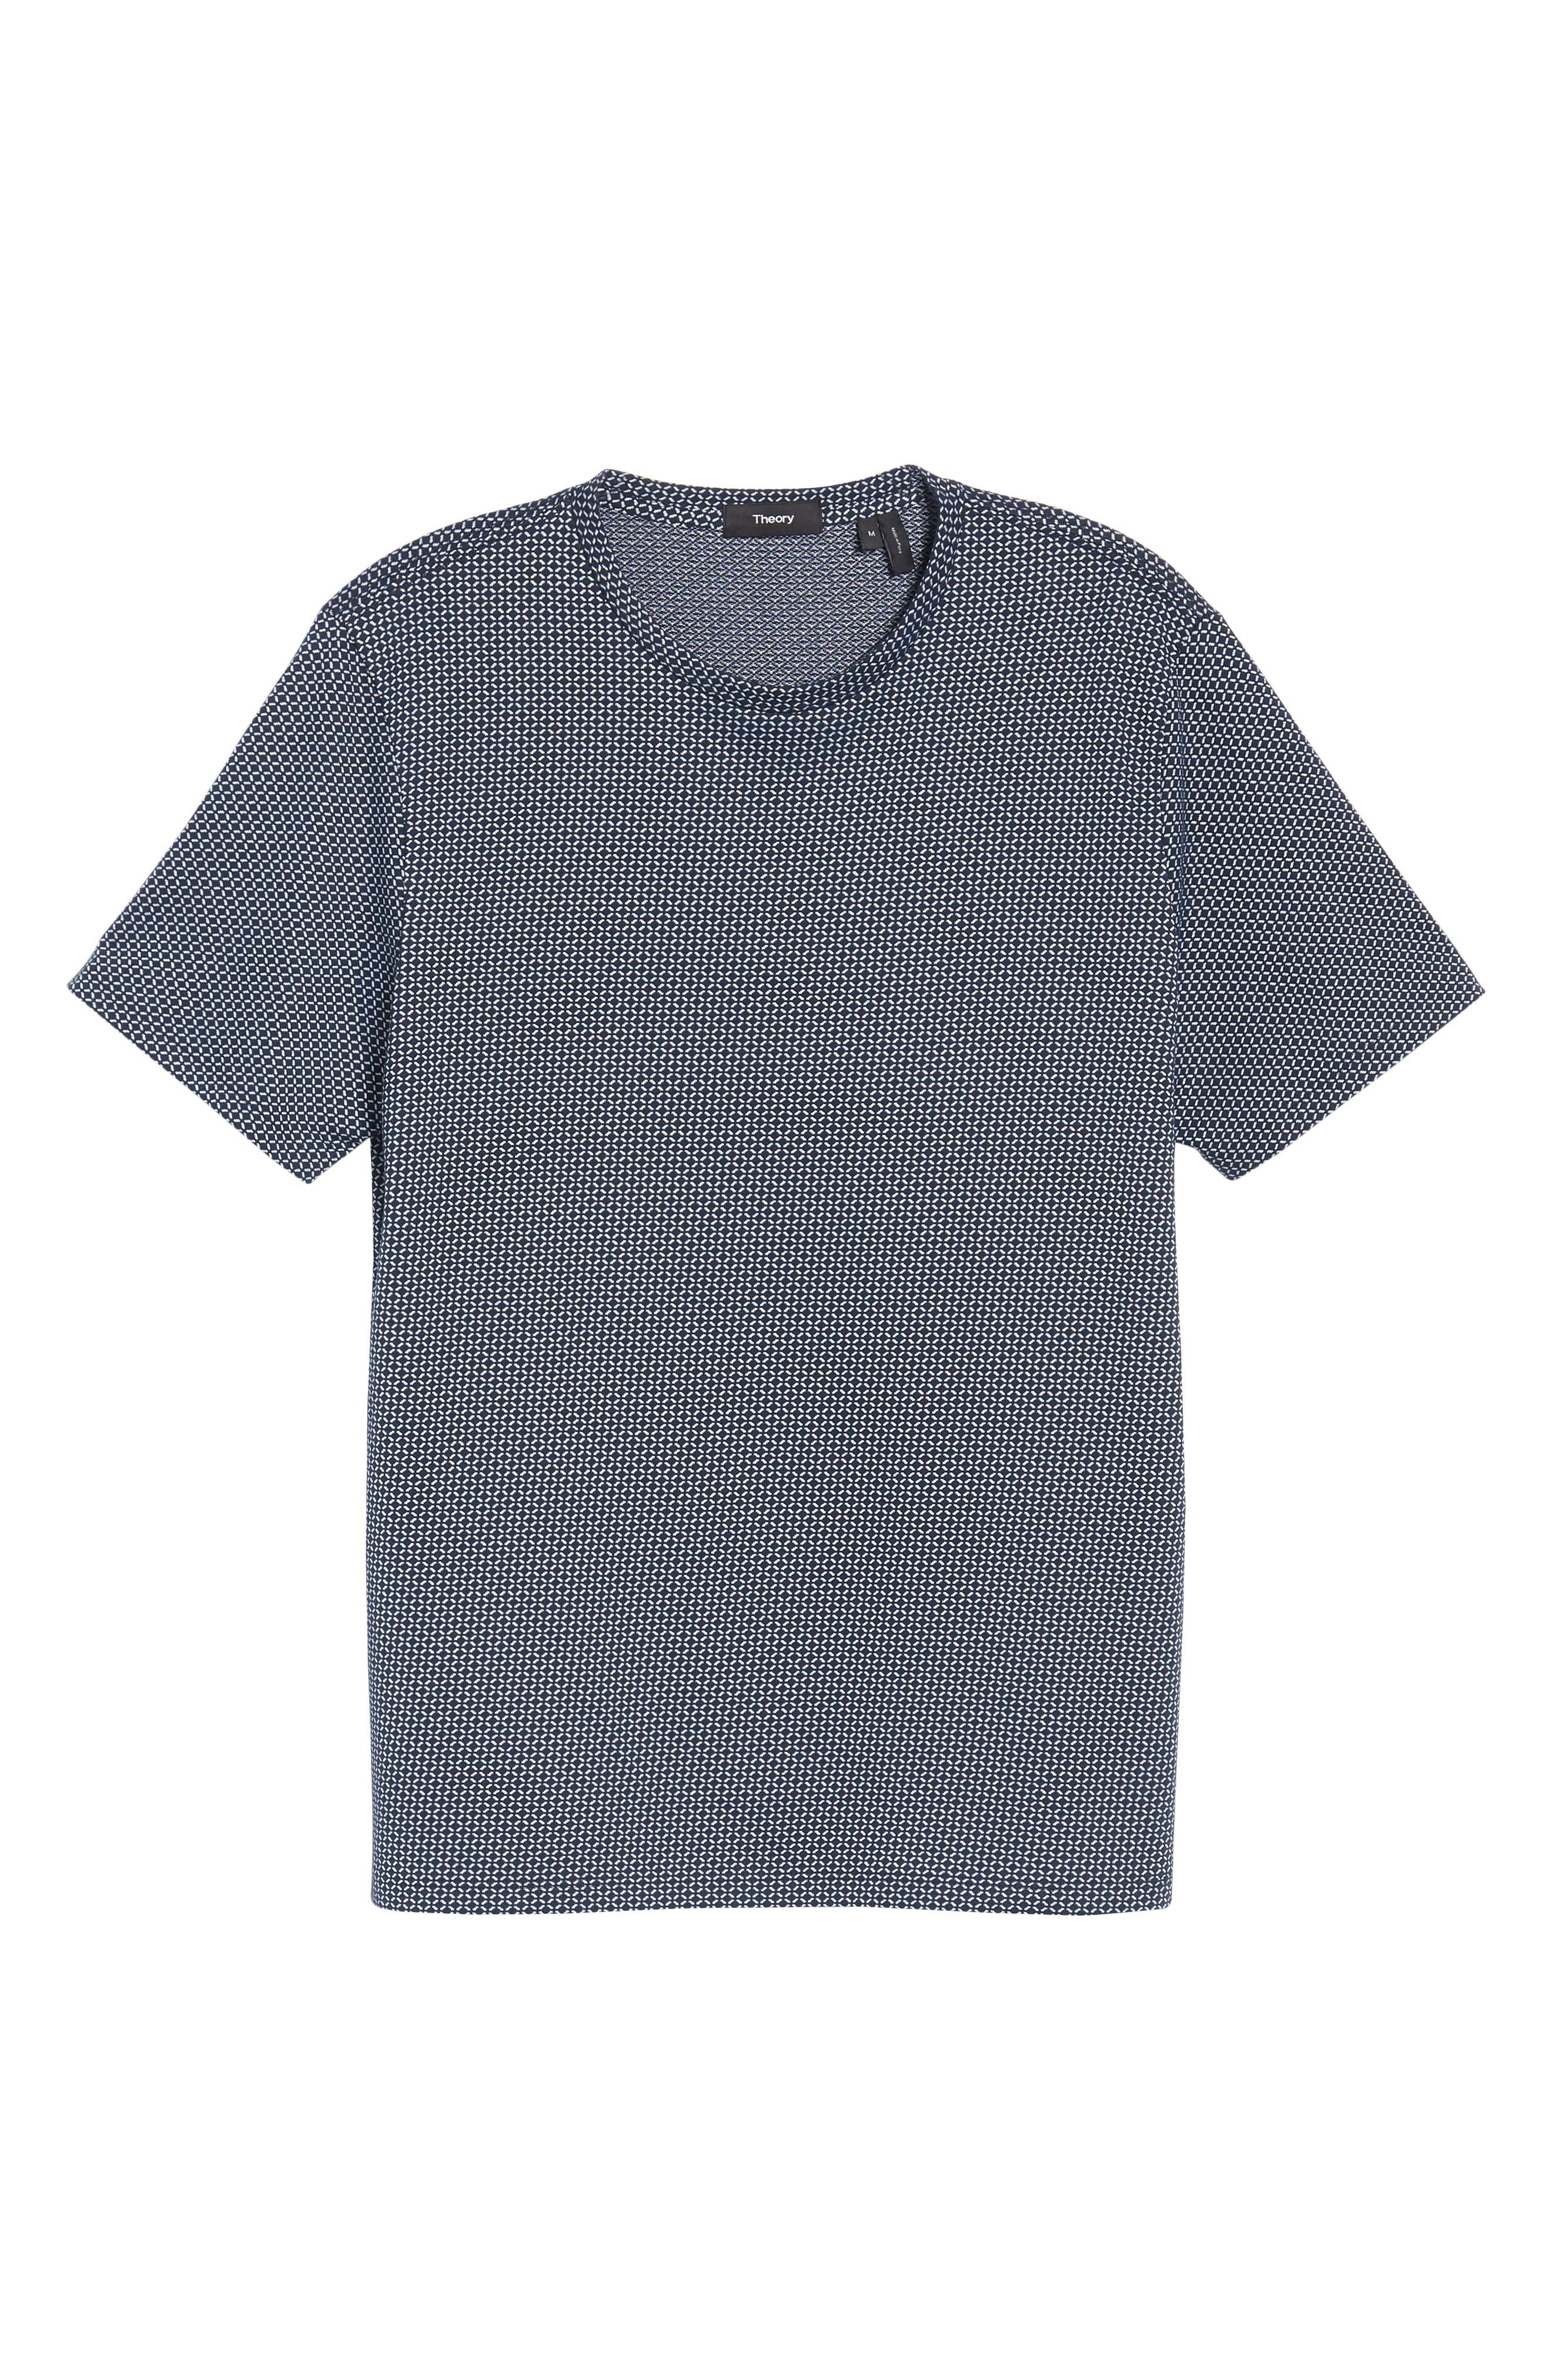 Sillar Print Crewneck T-Shirt,                             Alternate thumbnail 6, color,                             Eclipse/ White